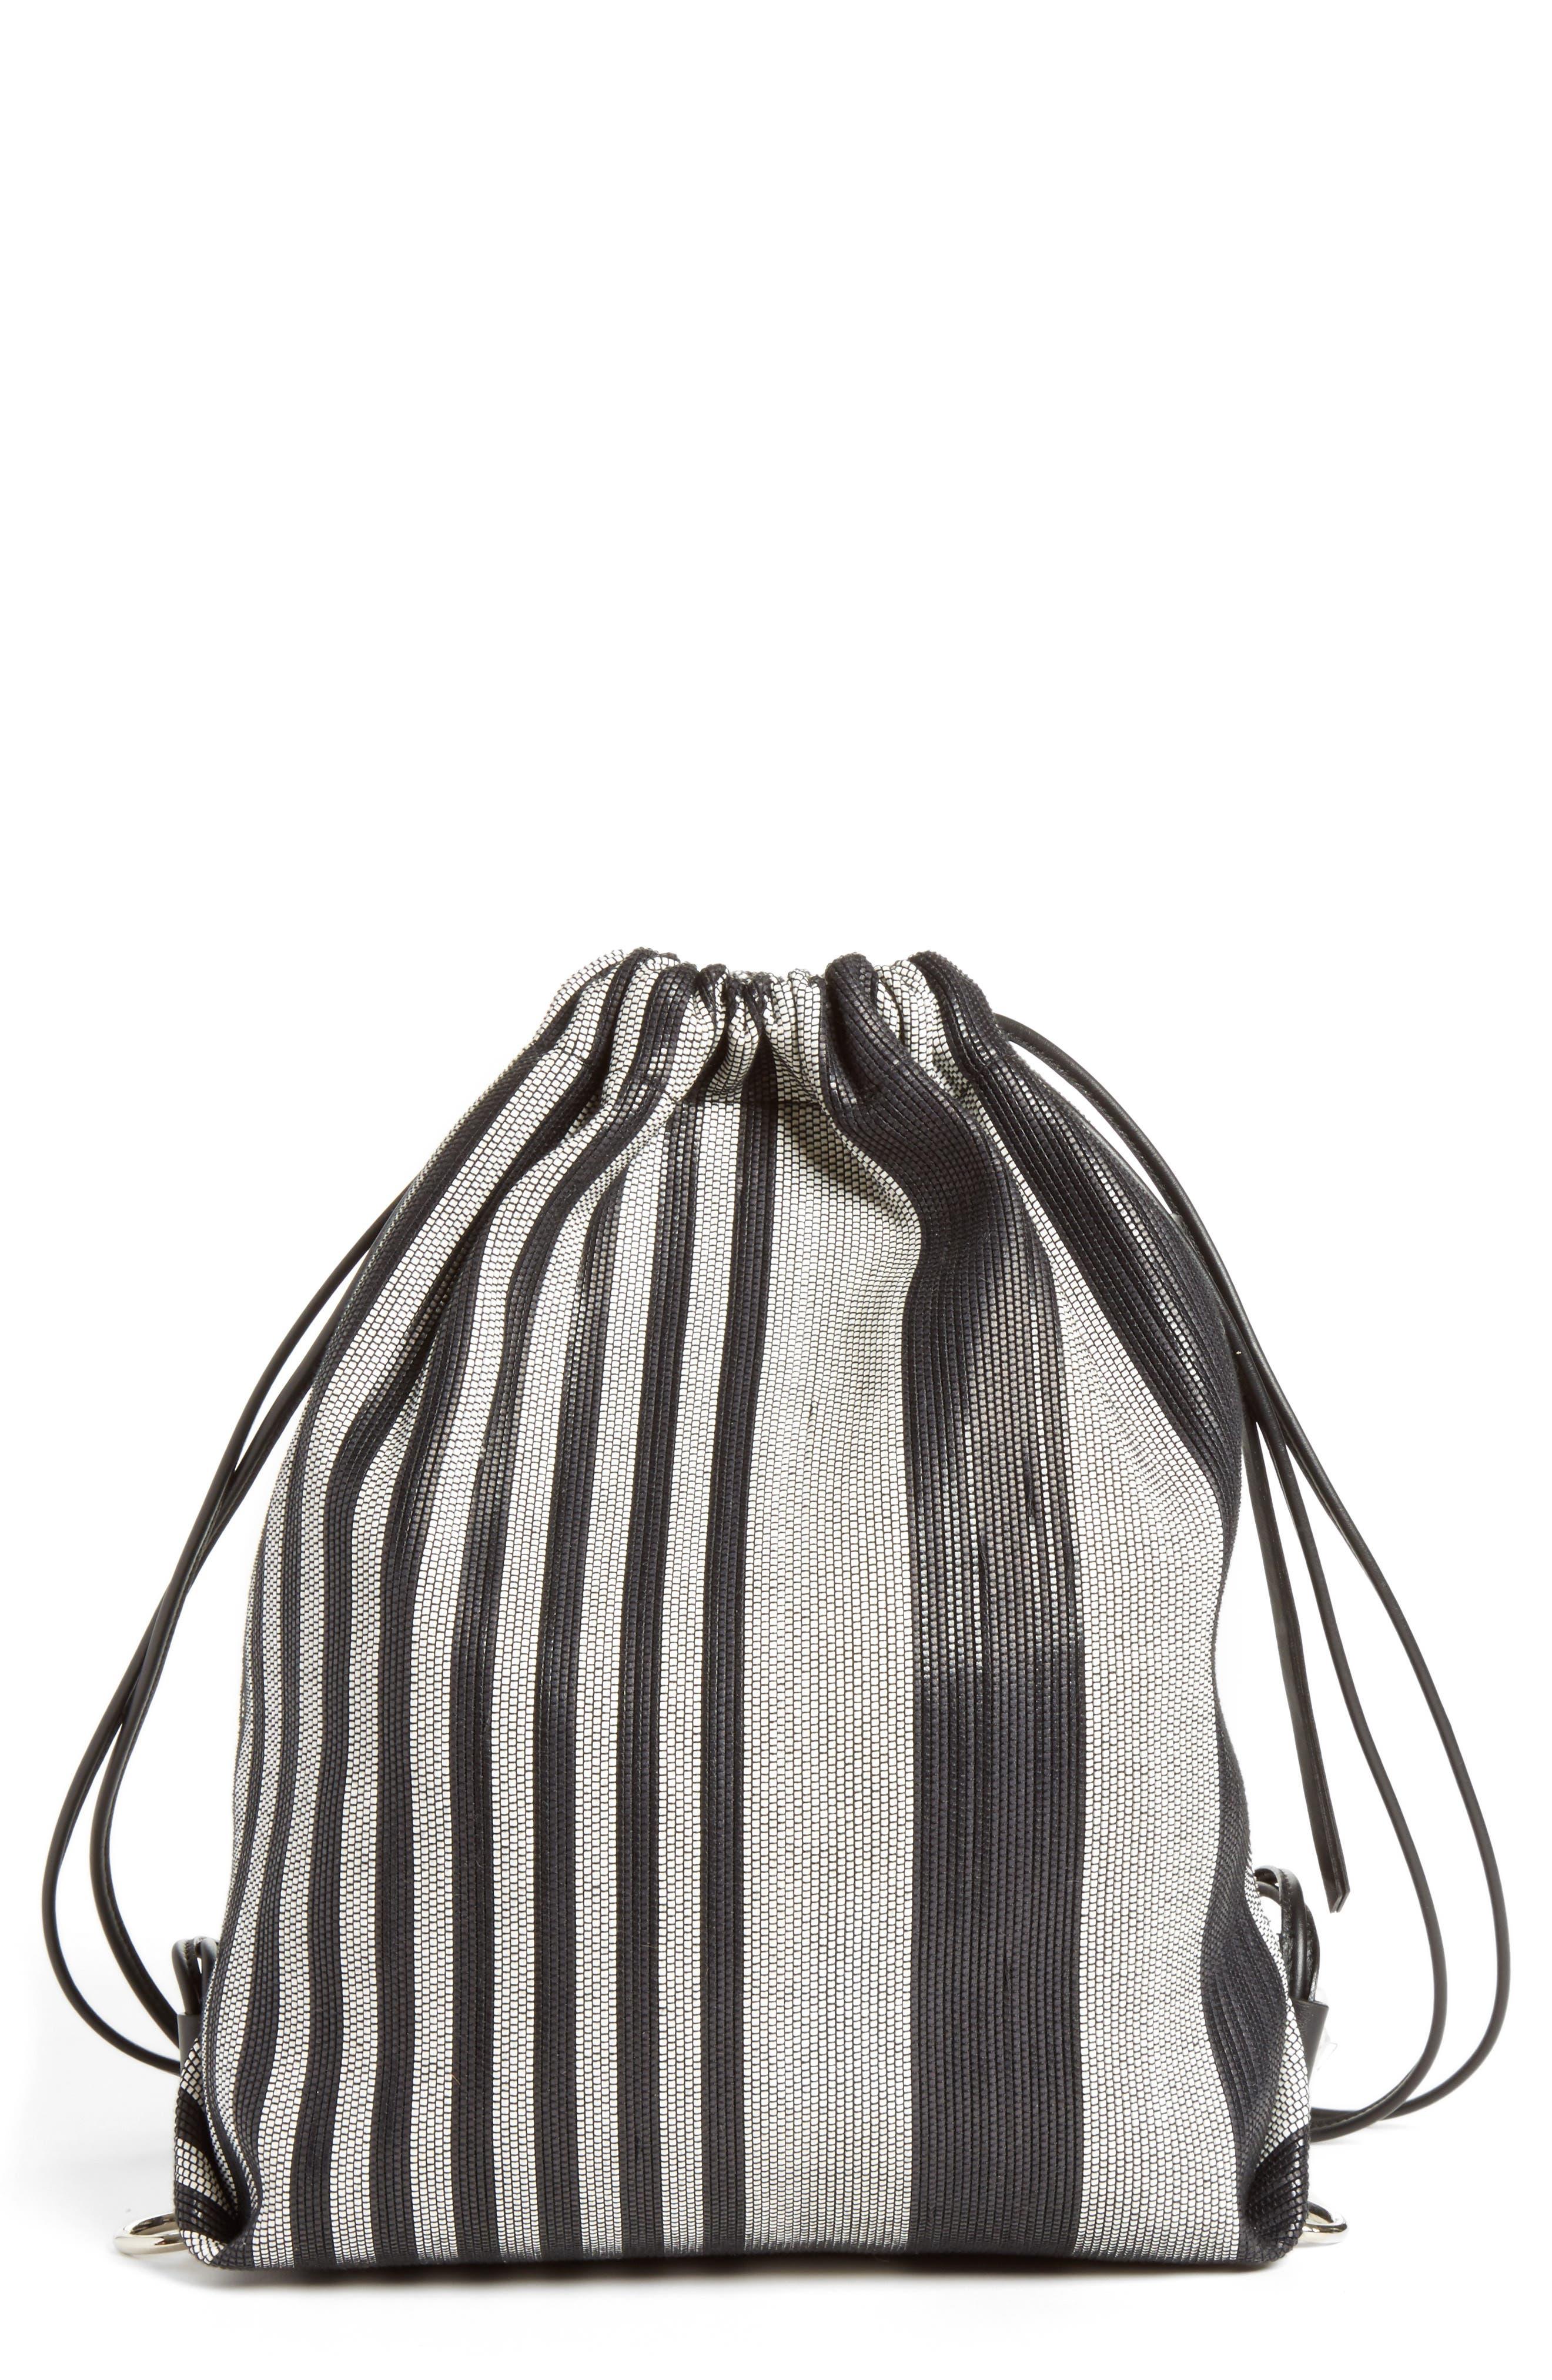 Main Image - Proenza Schouler Drawstring Backpack